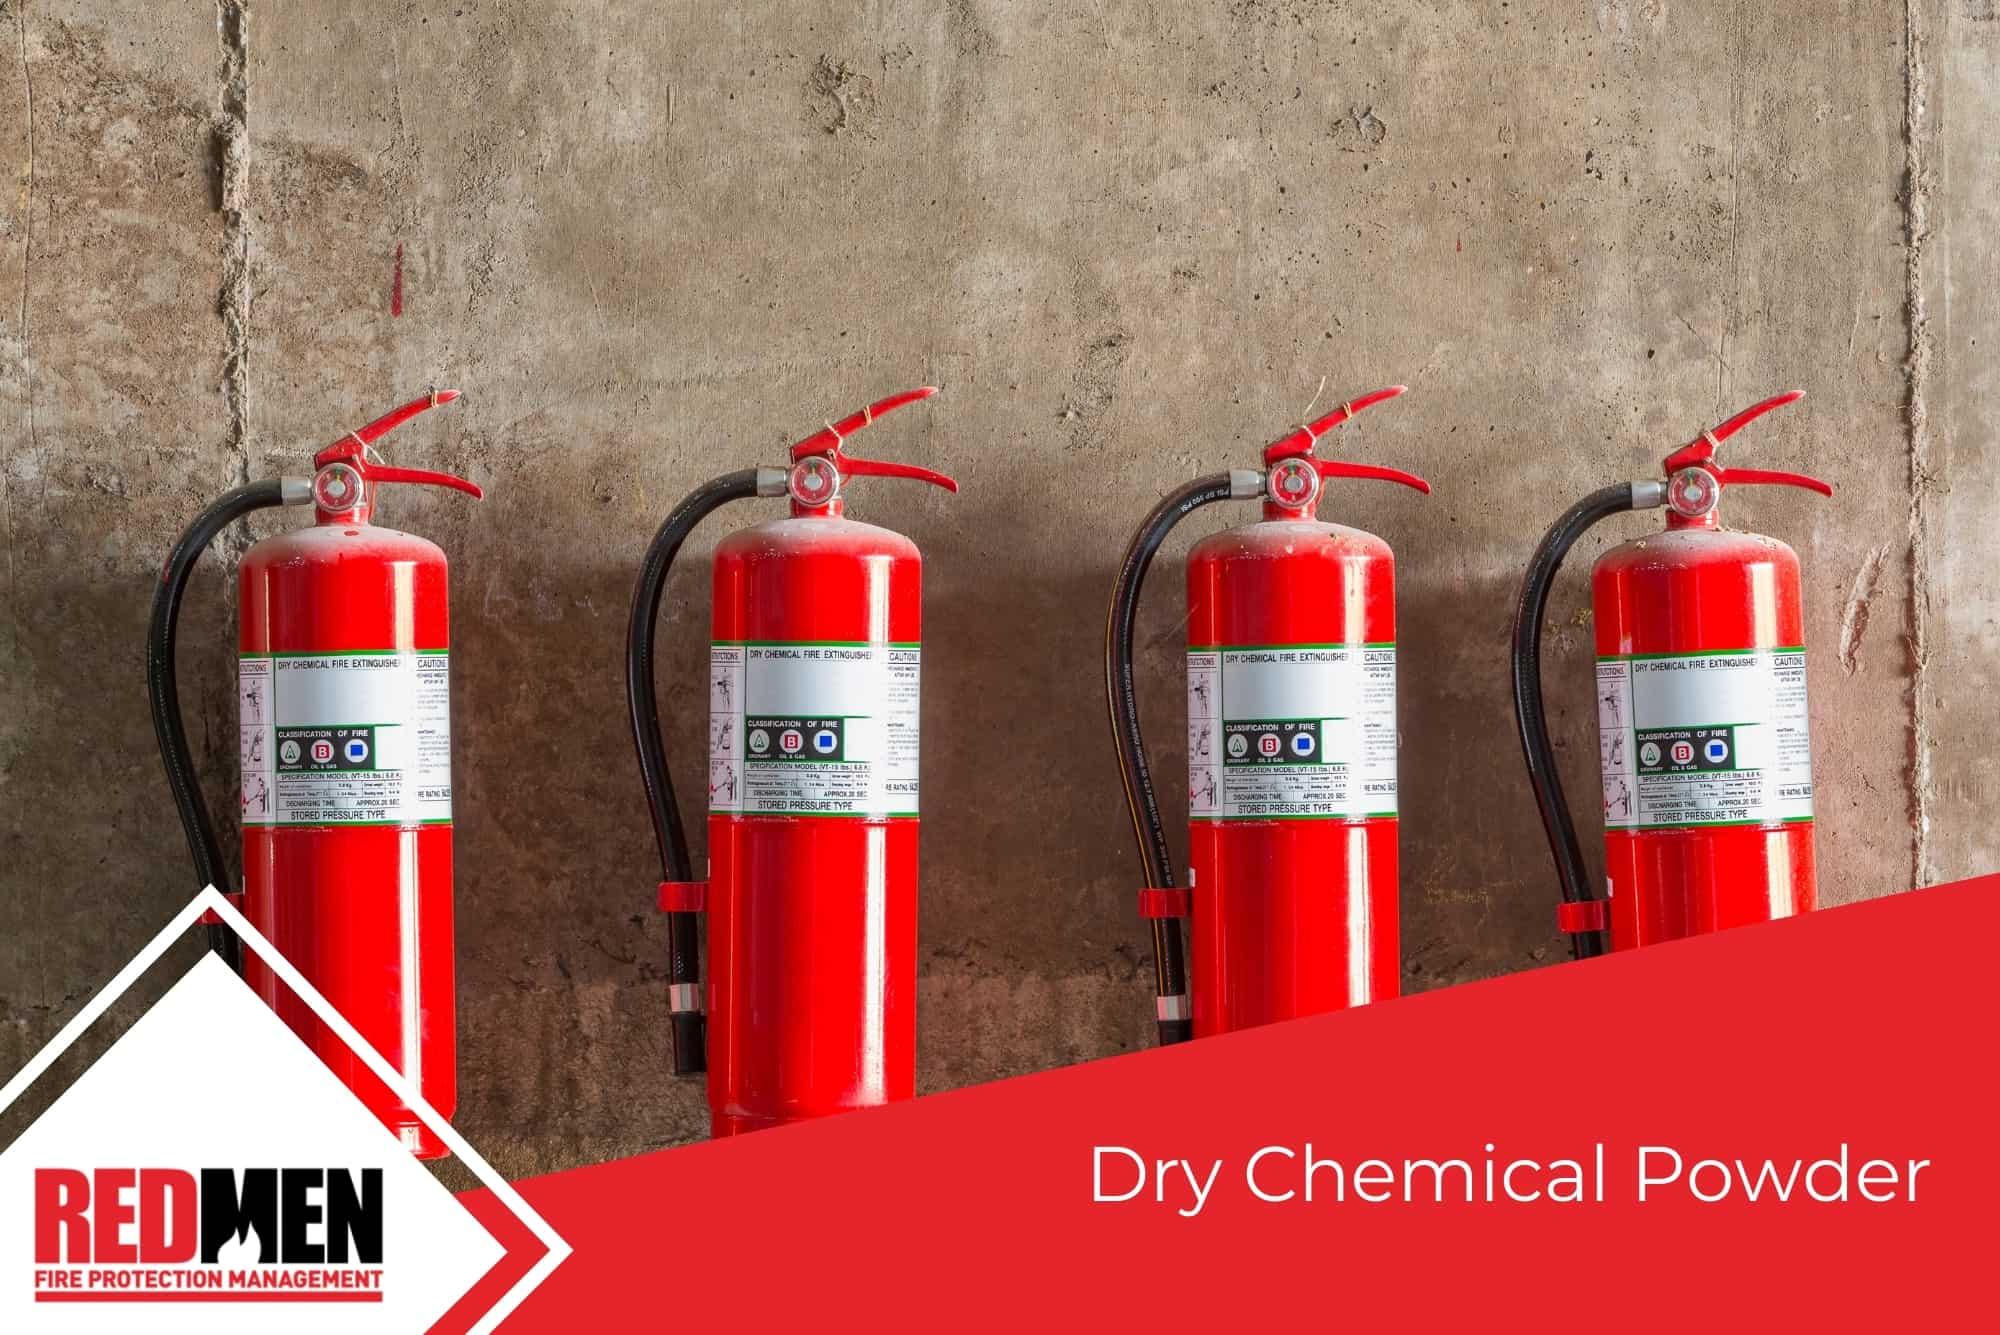 Dry Chemical Powder